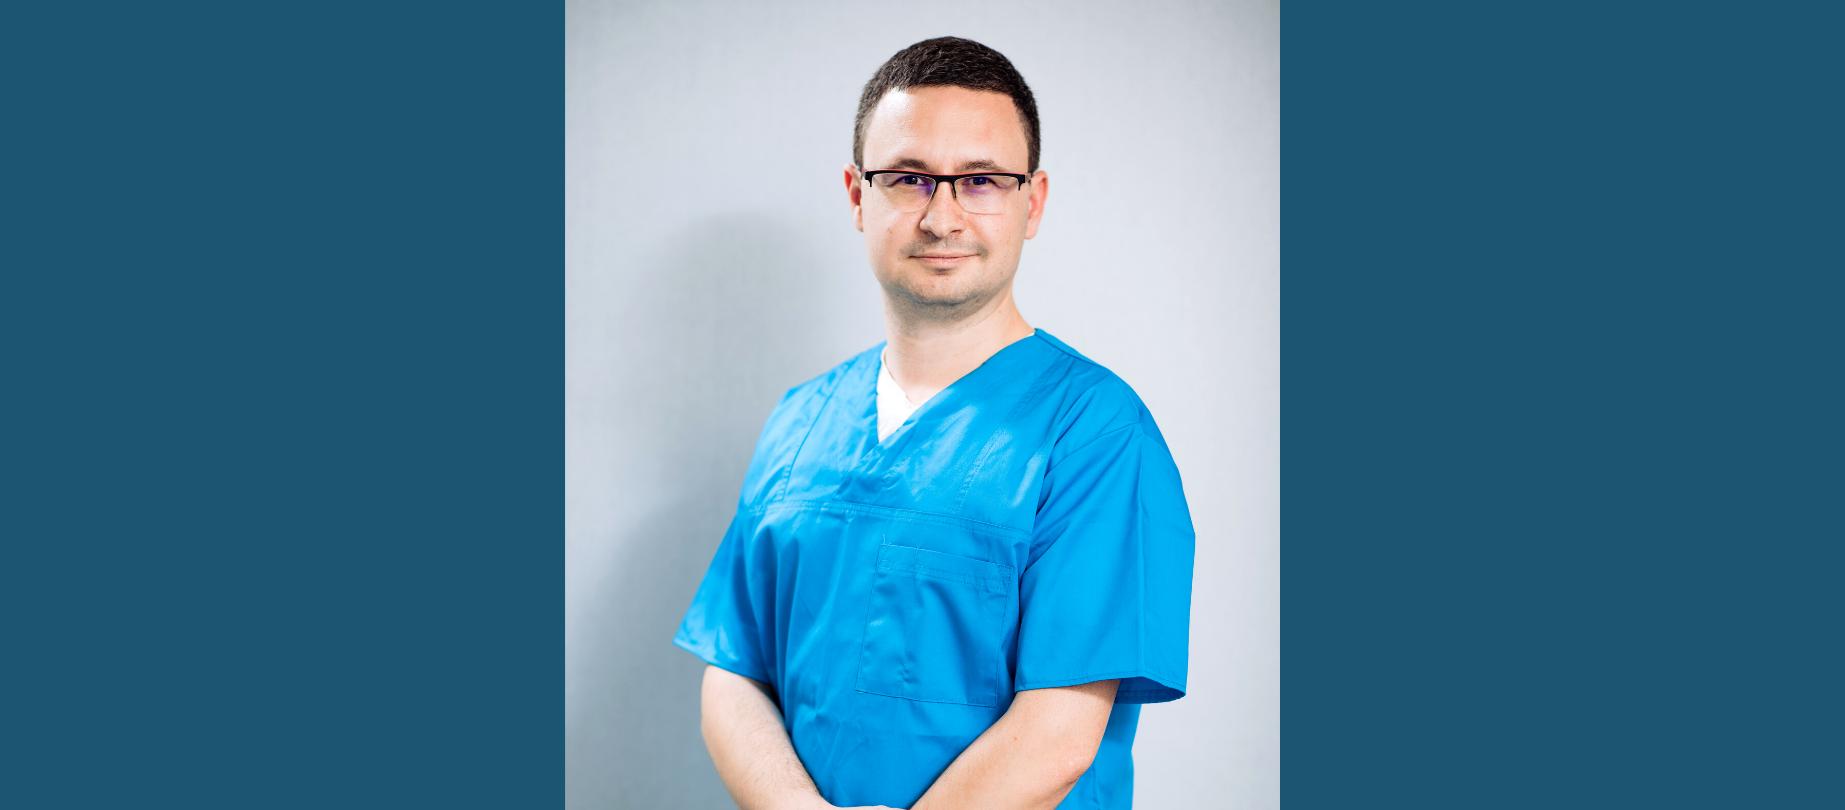 Doctor Laurențiu Stupariu Medic specialist oftalmolog